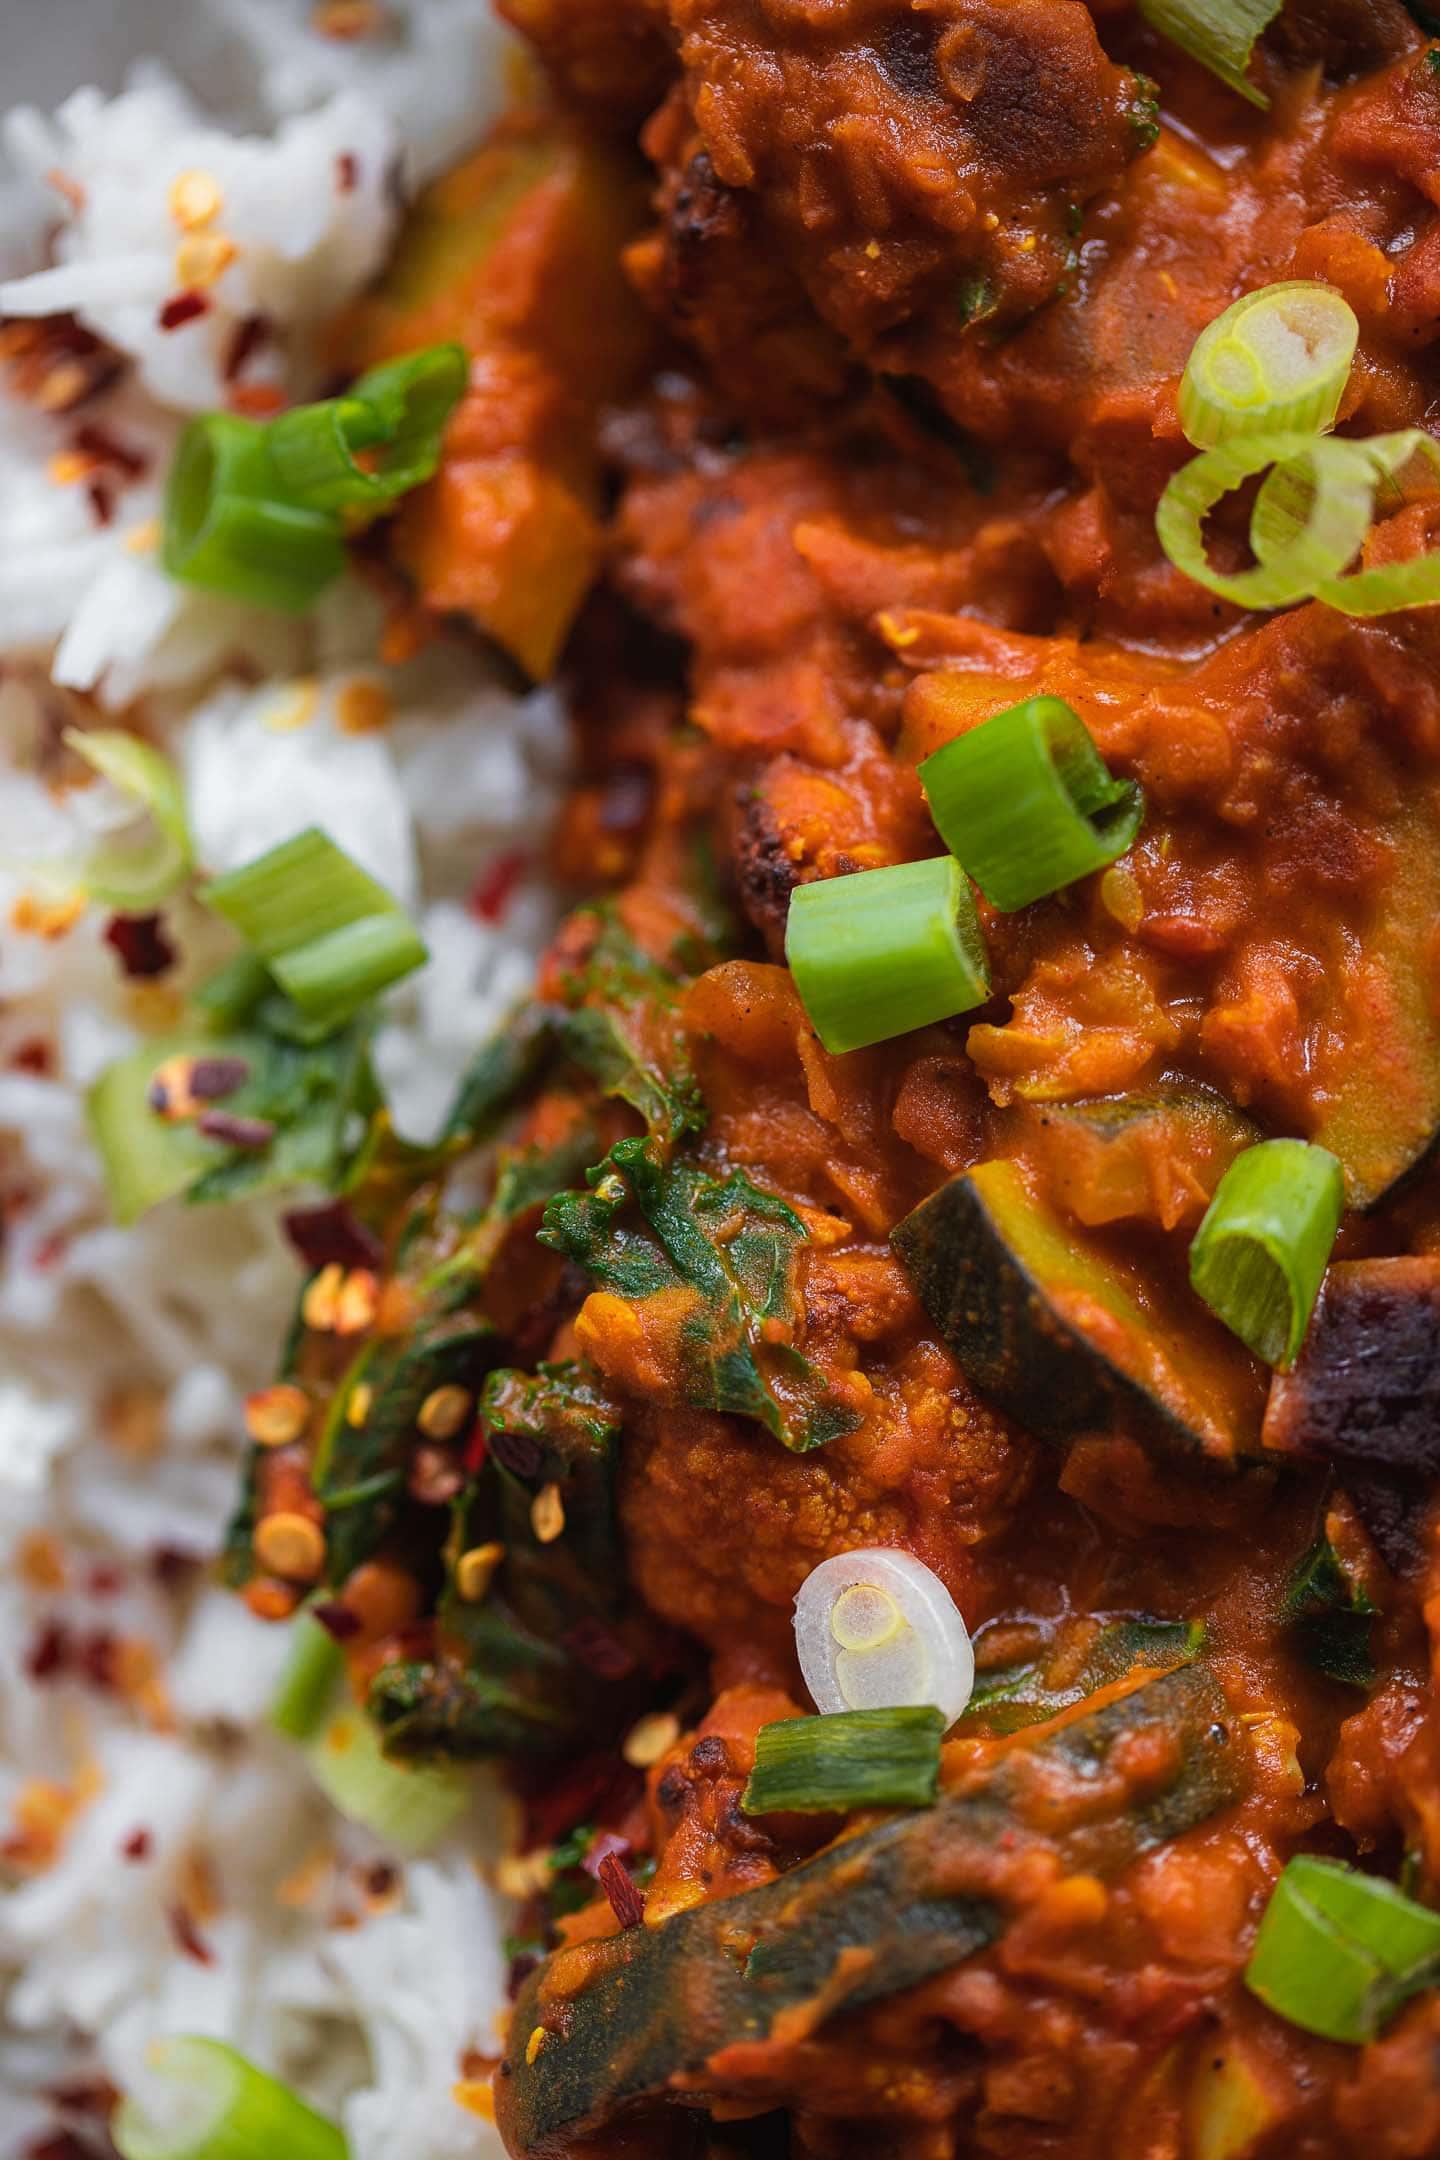 Cauliflower Dahl with red lentils